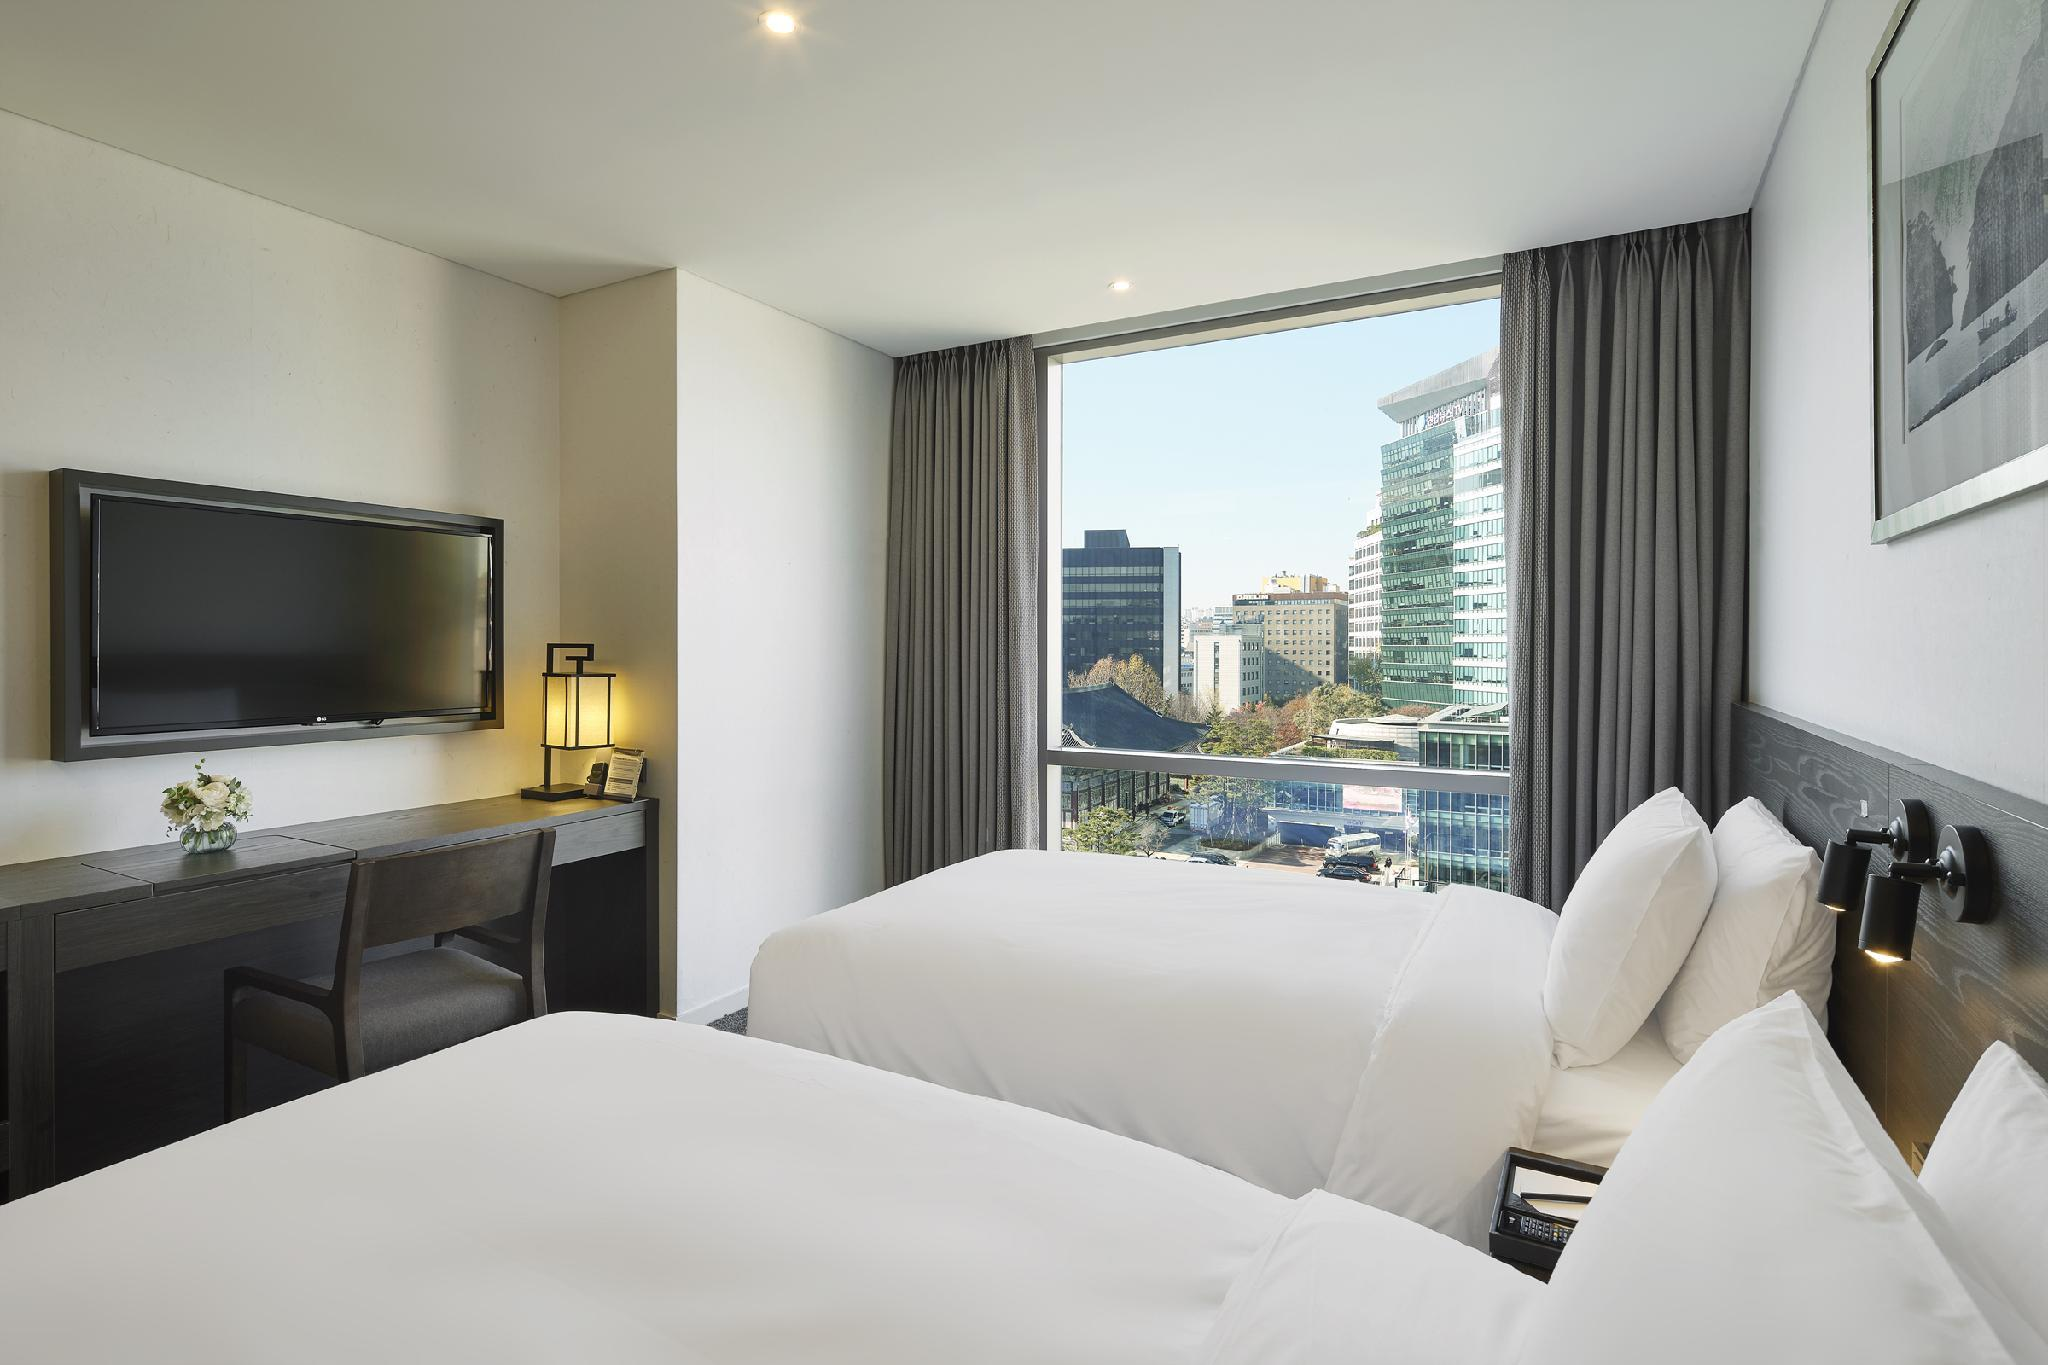 Nine Tree Premier Hotel Insadong Seoul South Korea